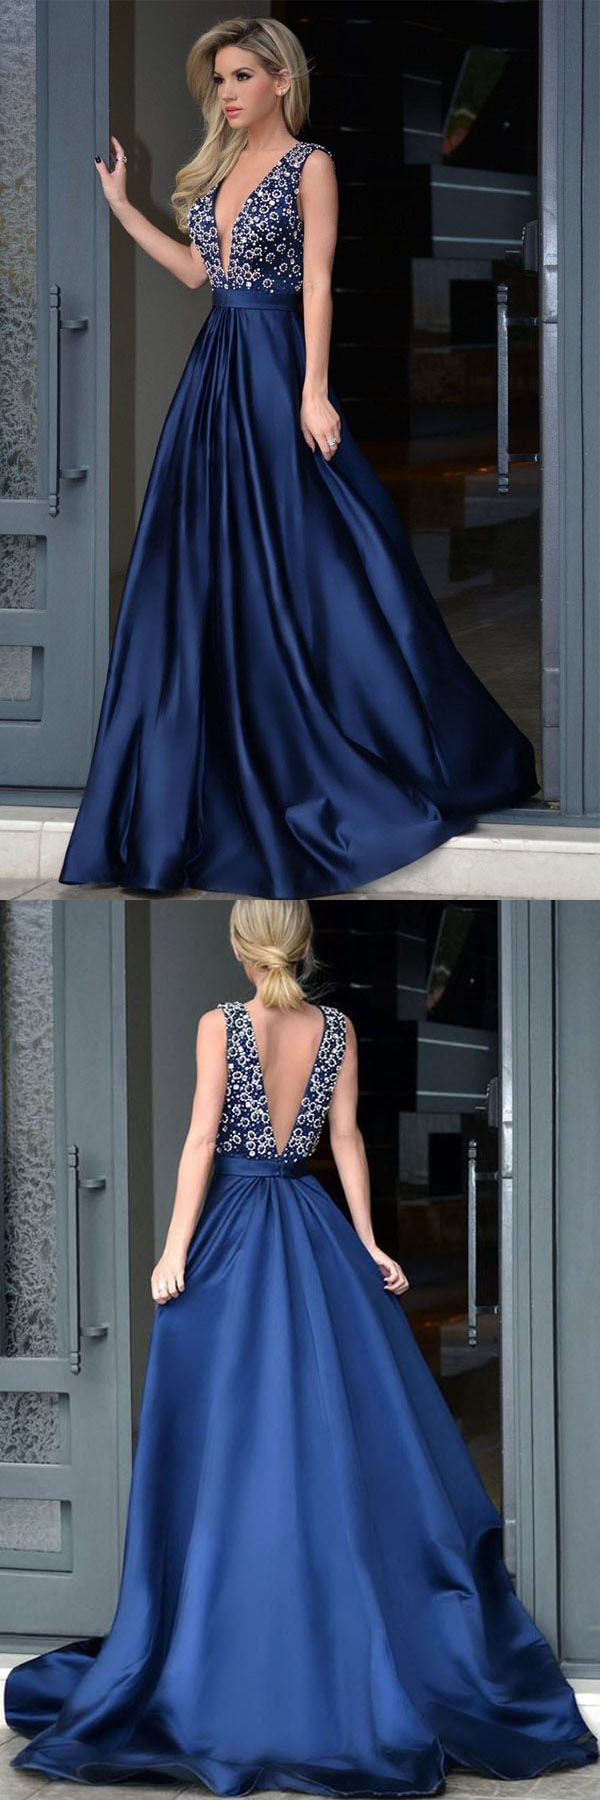 V-neck Royal Blue Satin Beading Prom Dresses With Sweep Train PG443 #promdress #eveningdress